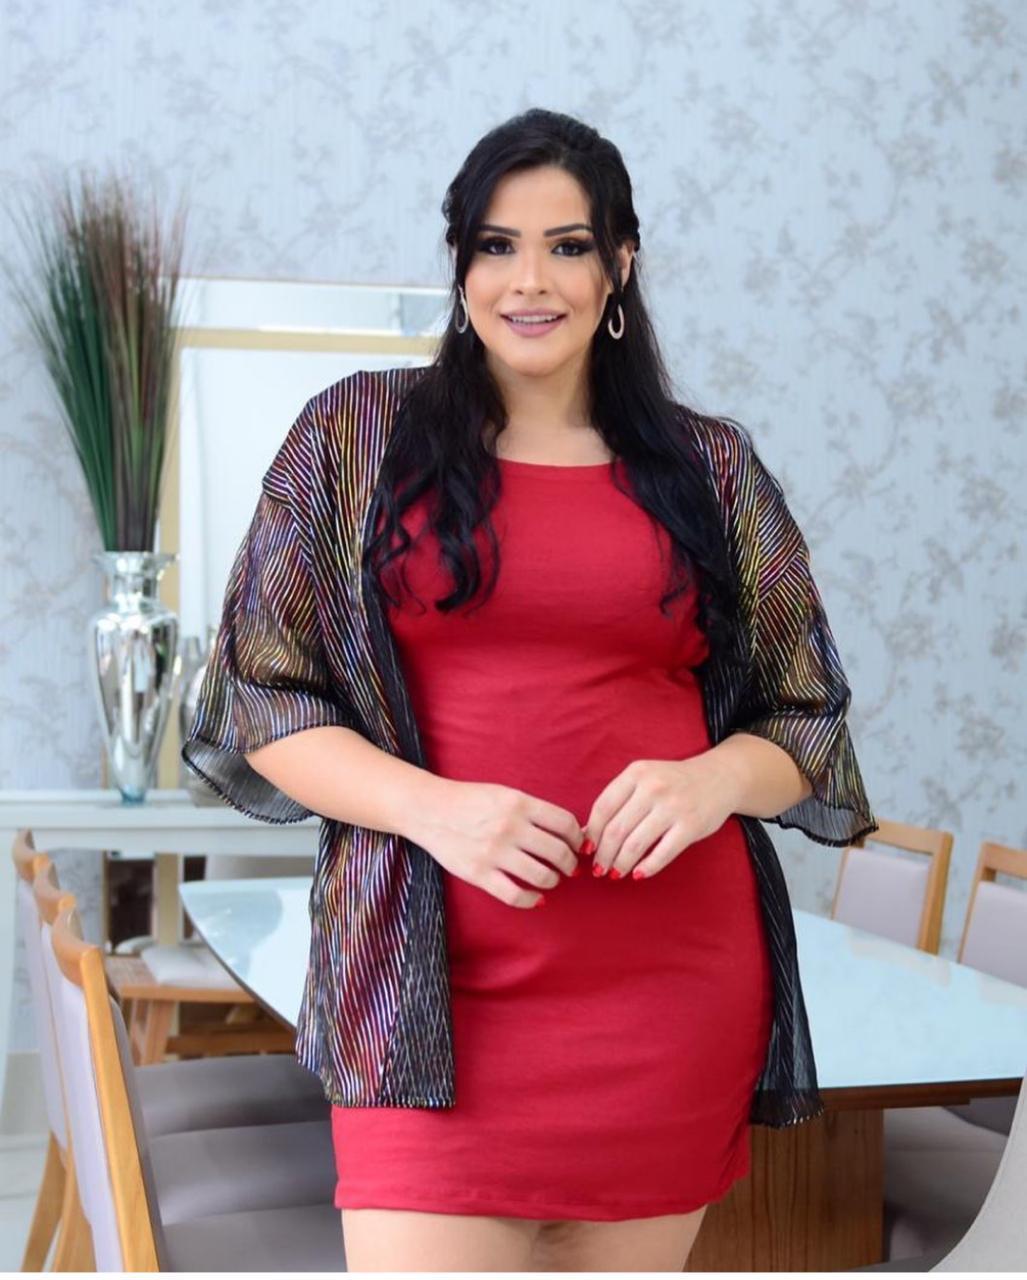 Kimono - Laissa Abreu